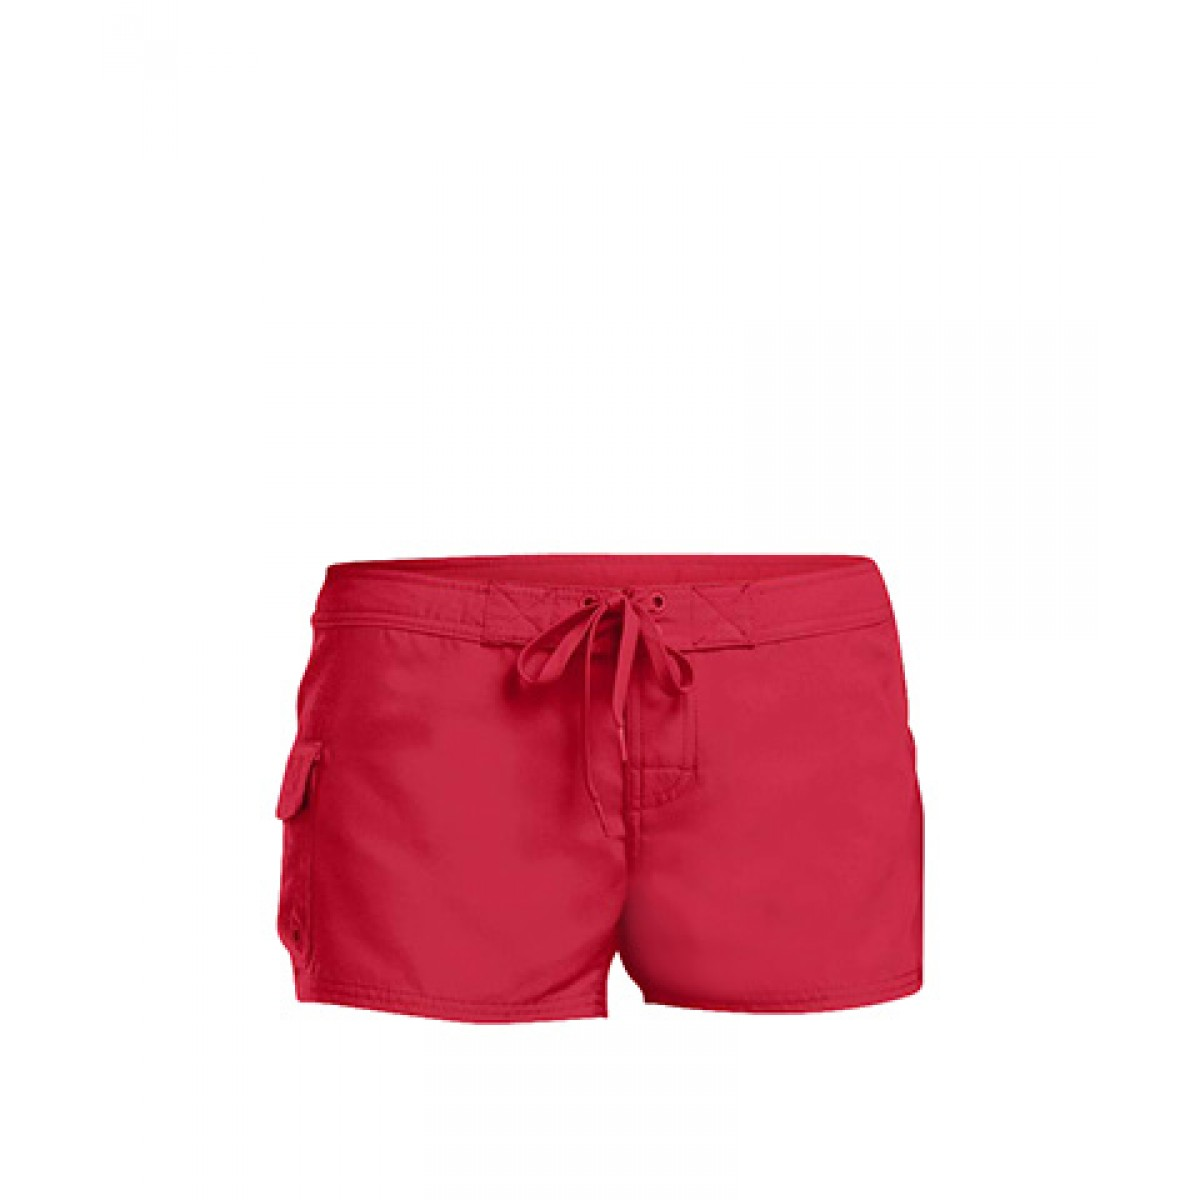 Juniors Boardshort-Red-S